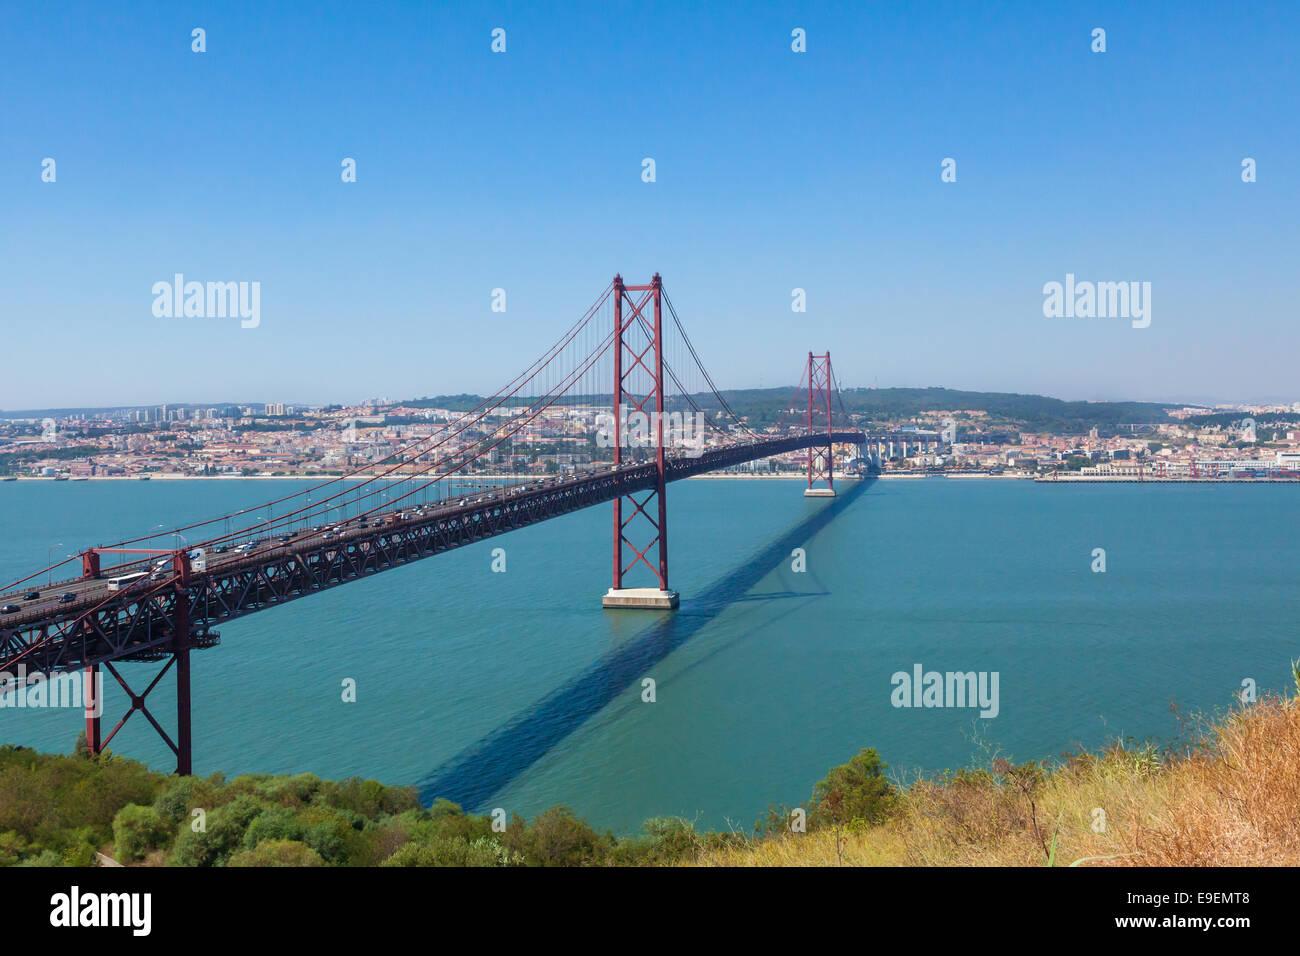 25th April Bridge in Lisbon, Ponto  25 de abril em Lisboa . Portugal - Stock Image